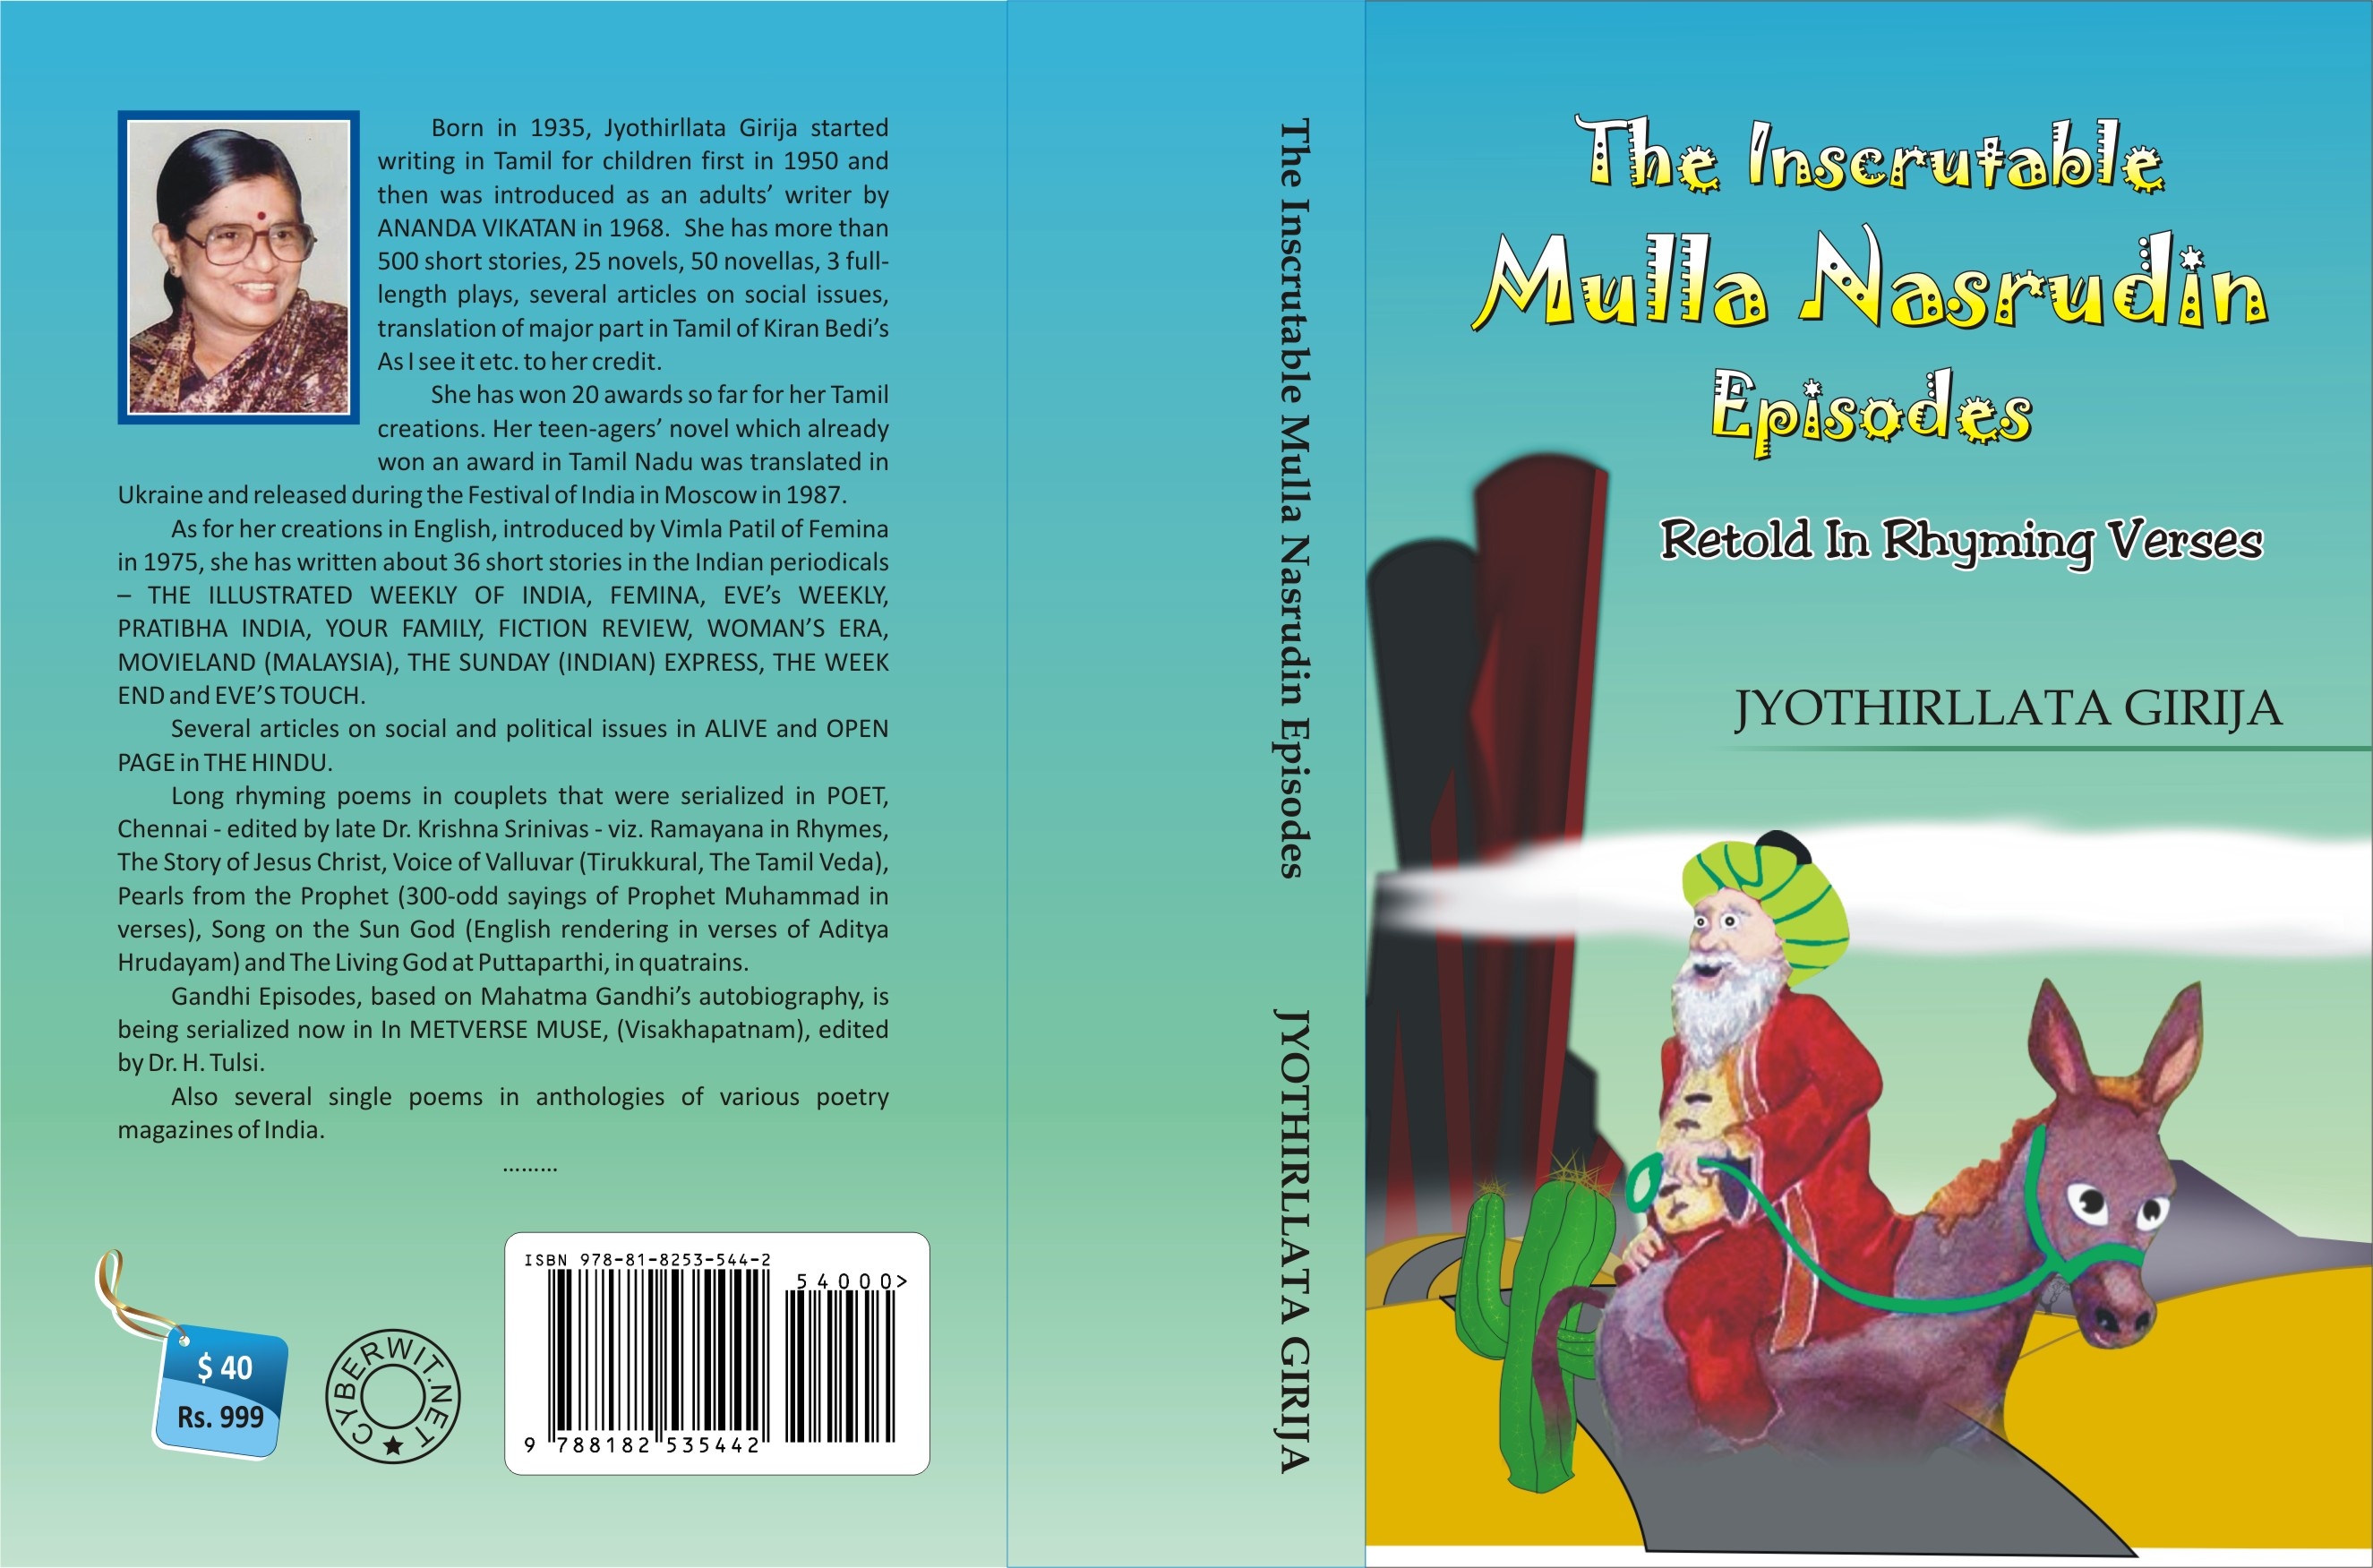 Muylla Nasrudin Episodes by jothirlatha Girija